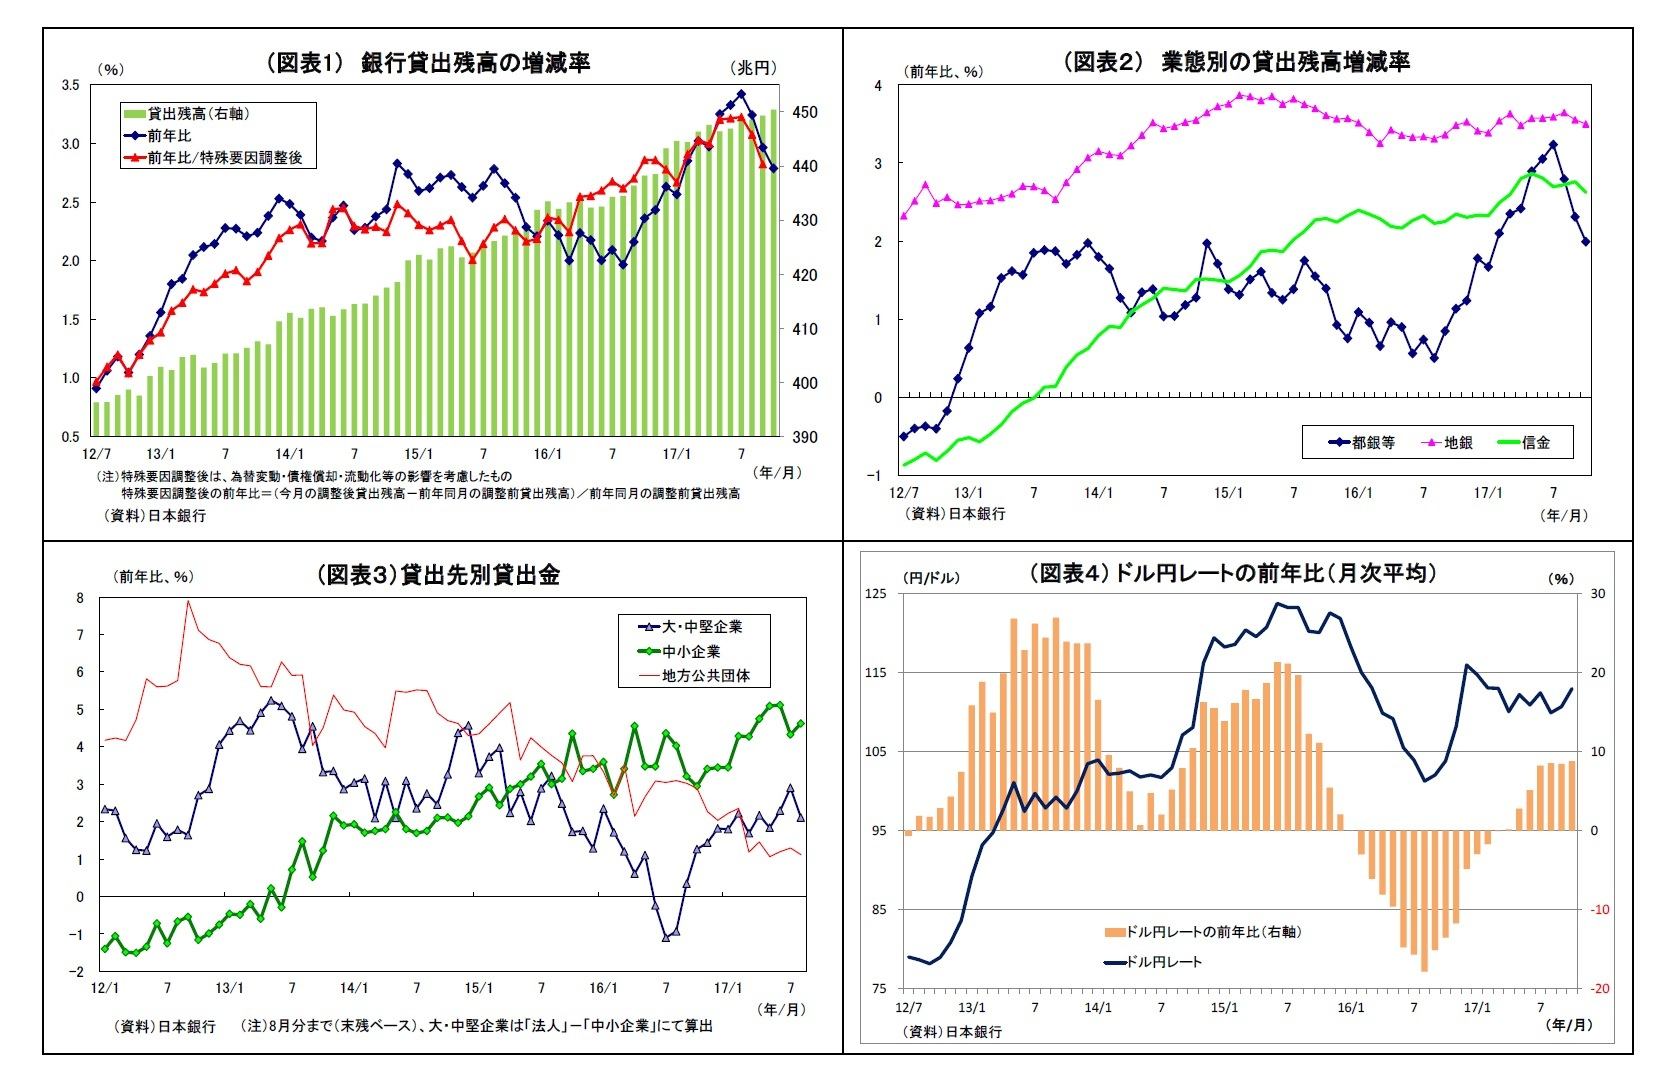 (図表1) 銀行貸出残高の増減率/(図表2) 業態別の貸出残高増減率/(図表3)貸出先別貸出金/(図表4) ドル円レートの前年比(月次平均)